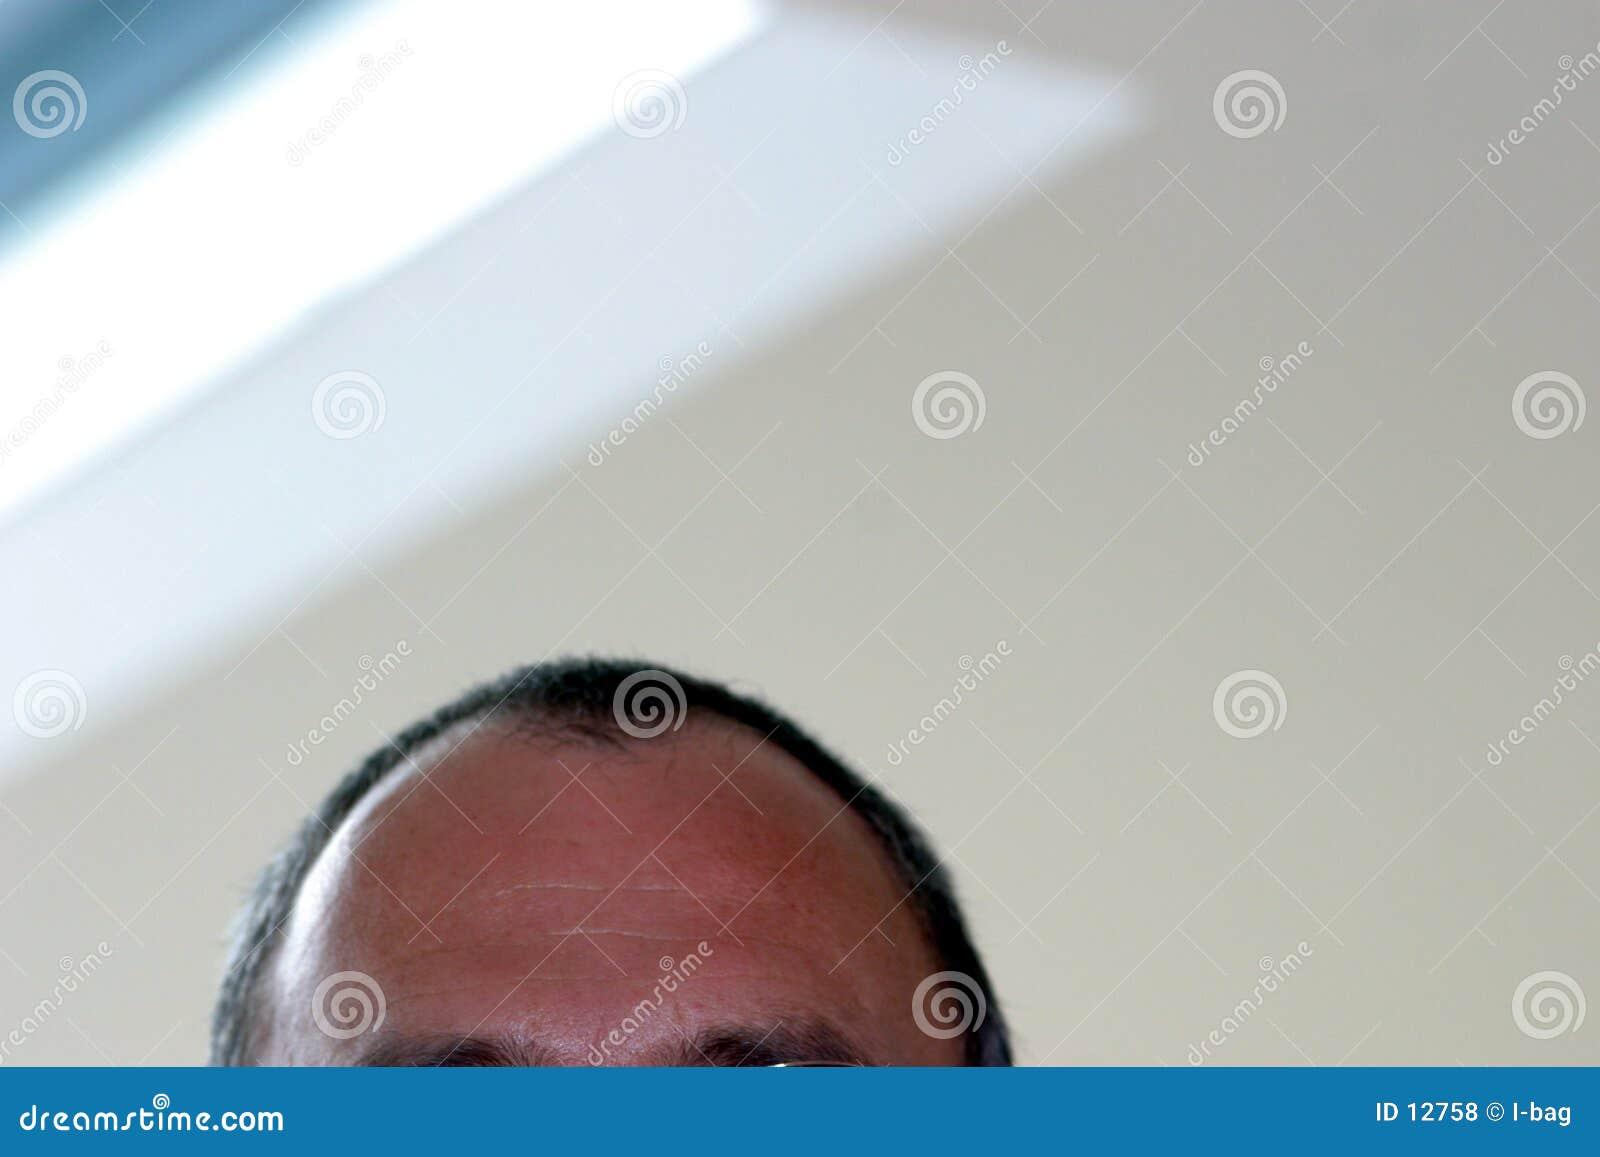 Male forehead